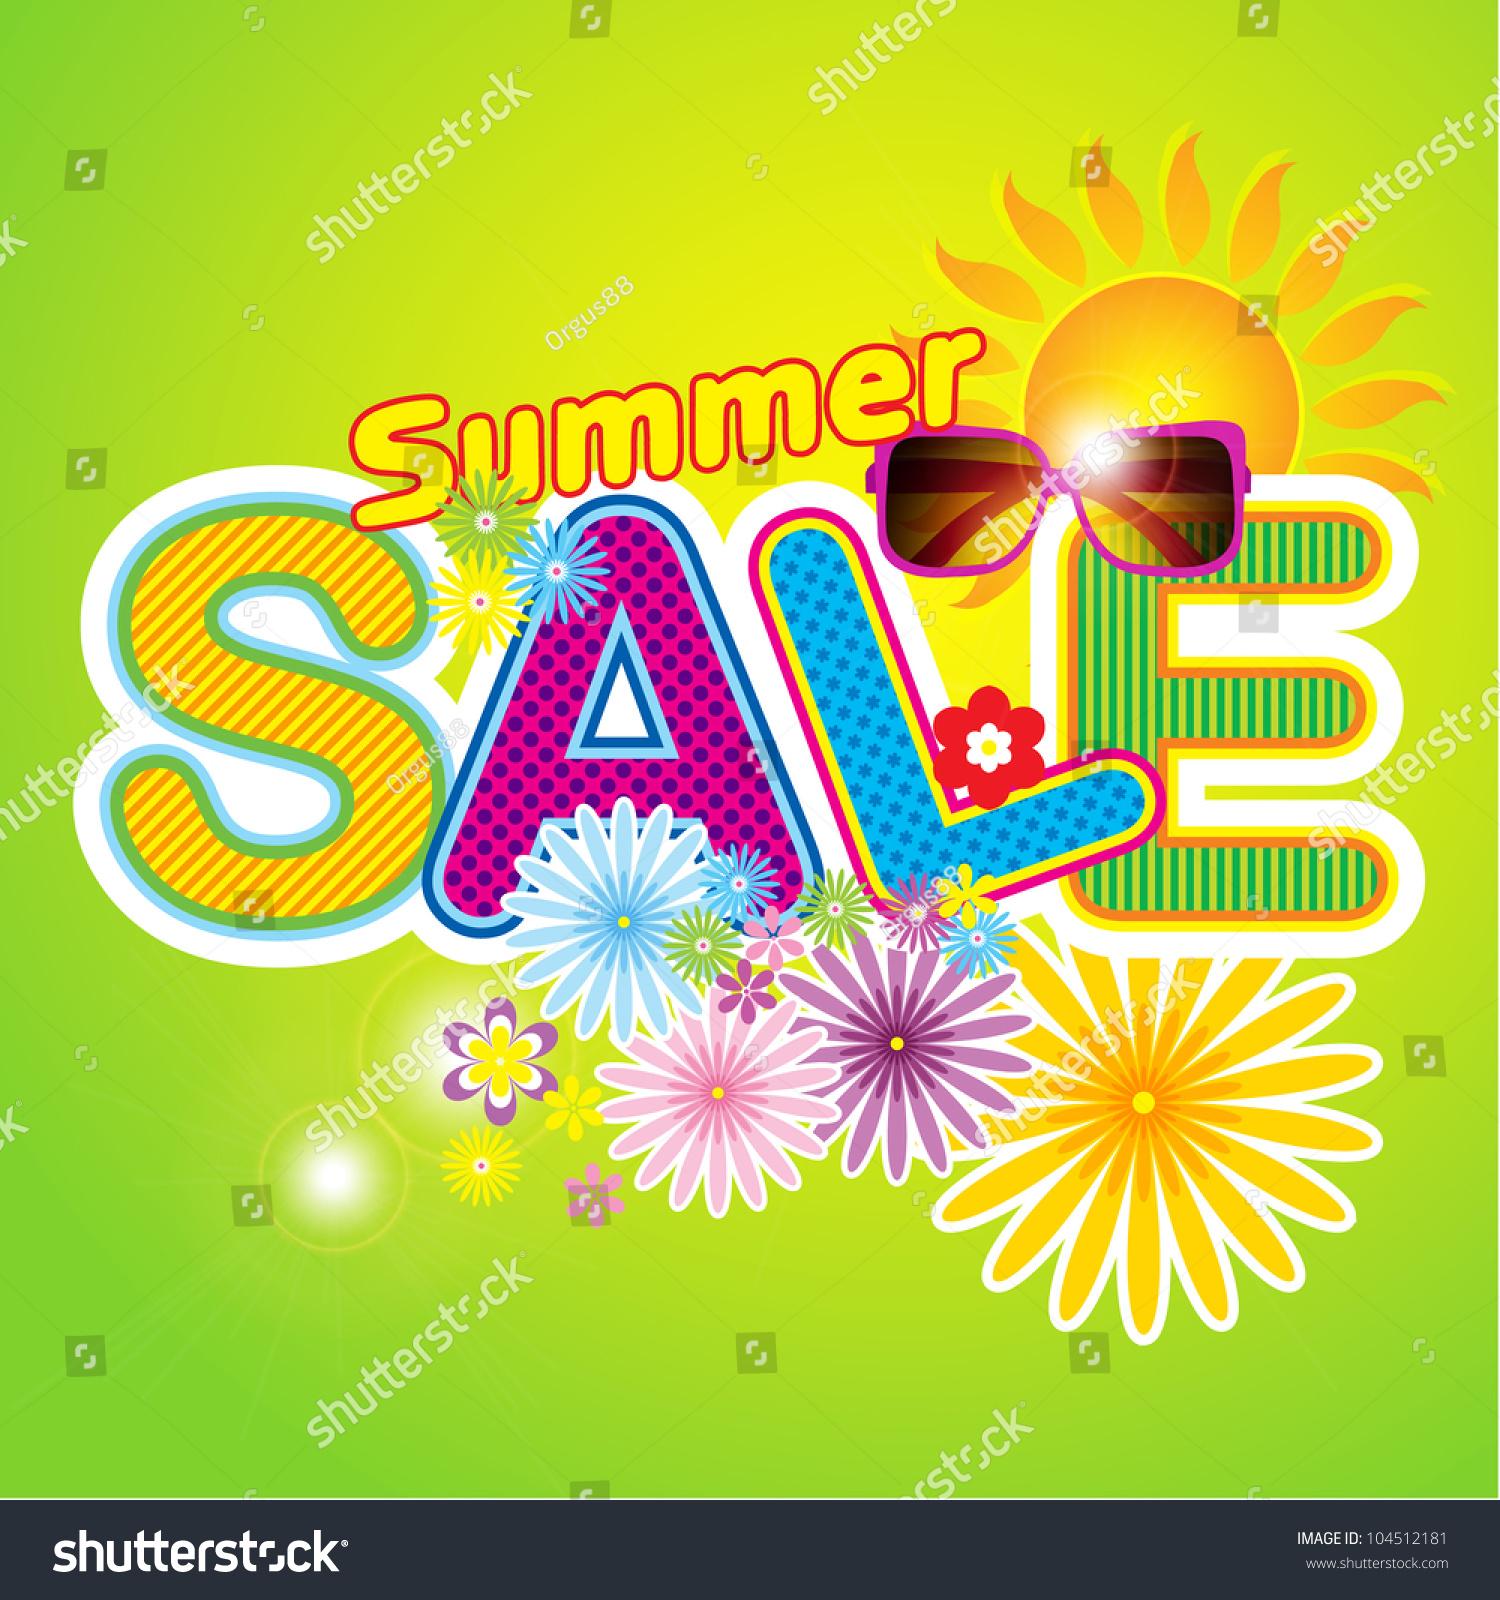 summer icon summer template stock vector  summer icon summer template summer fashion